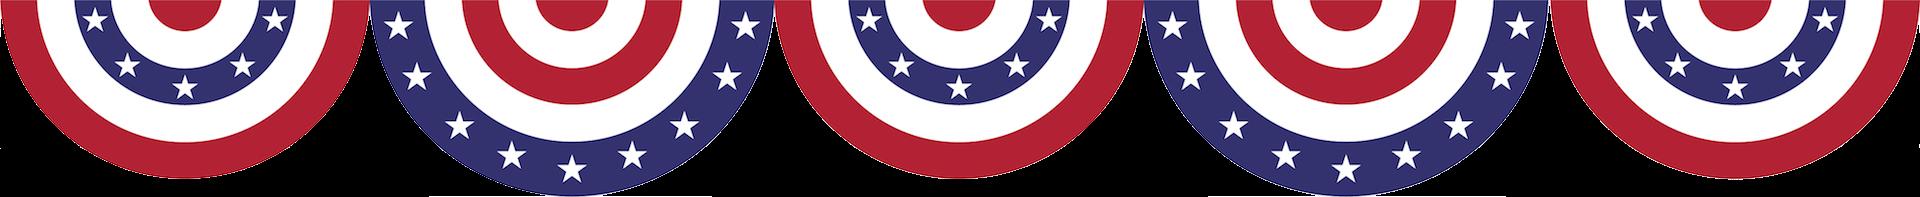 Americana Banner